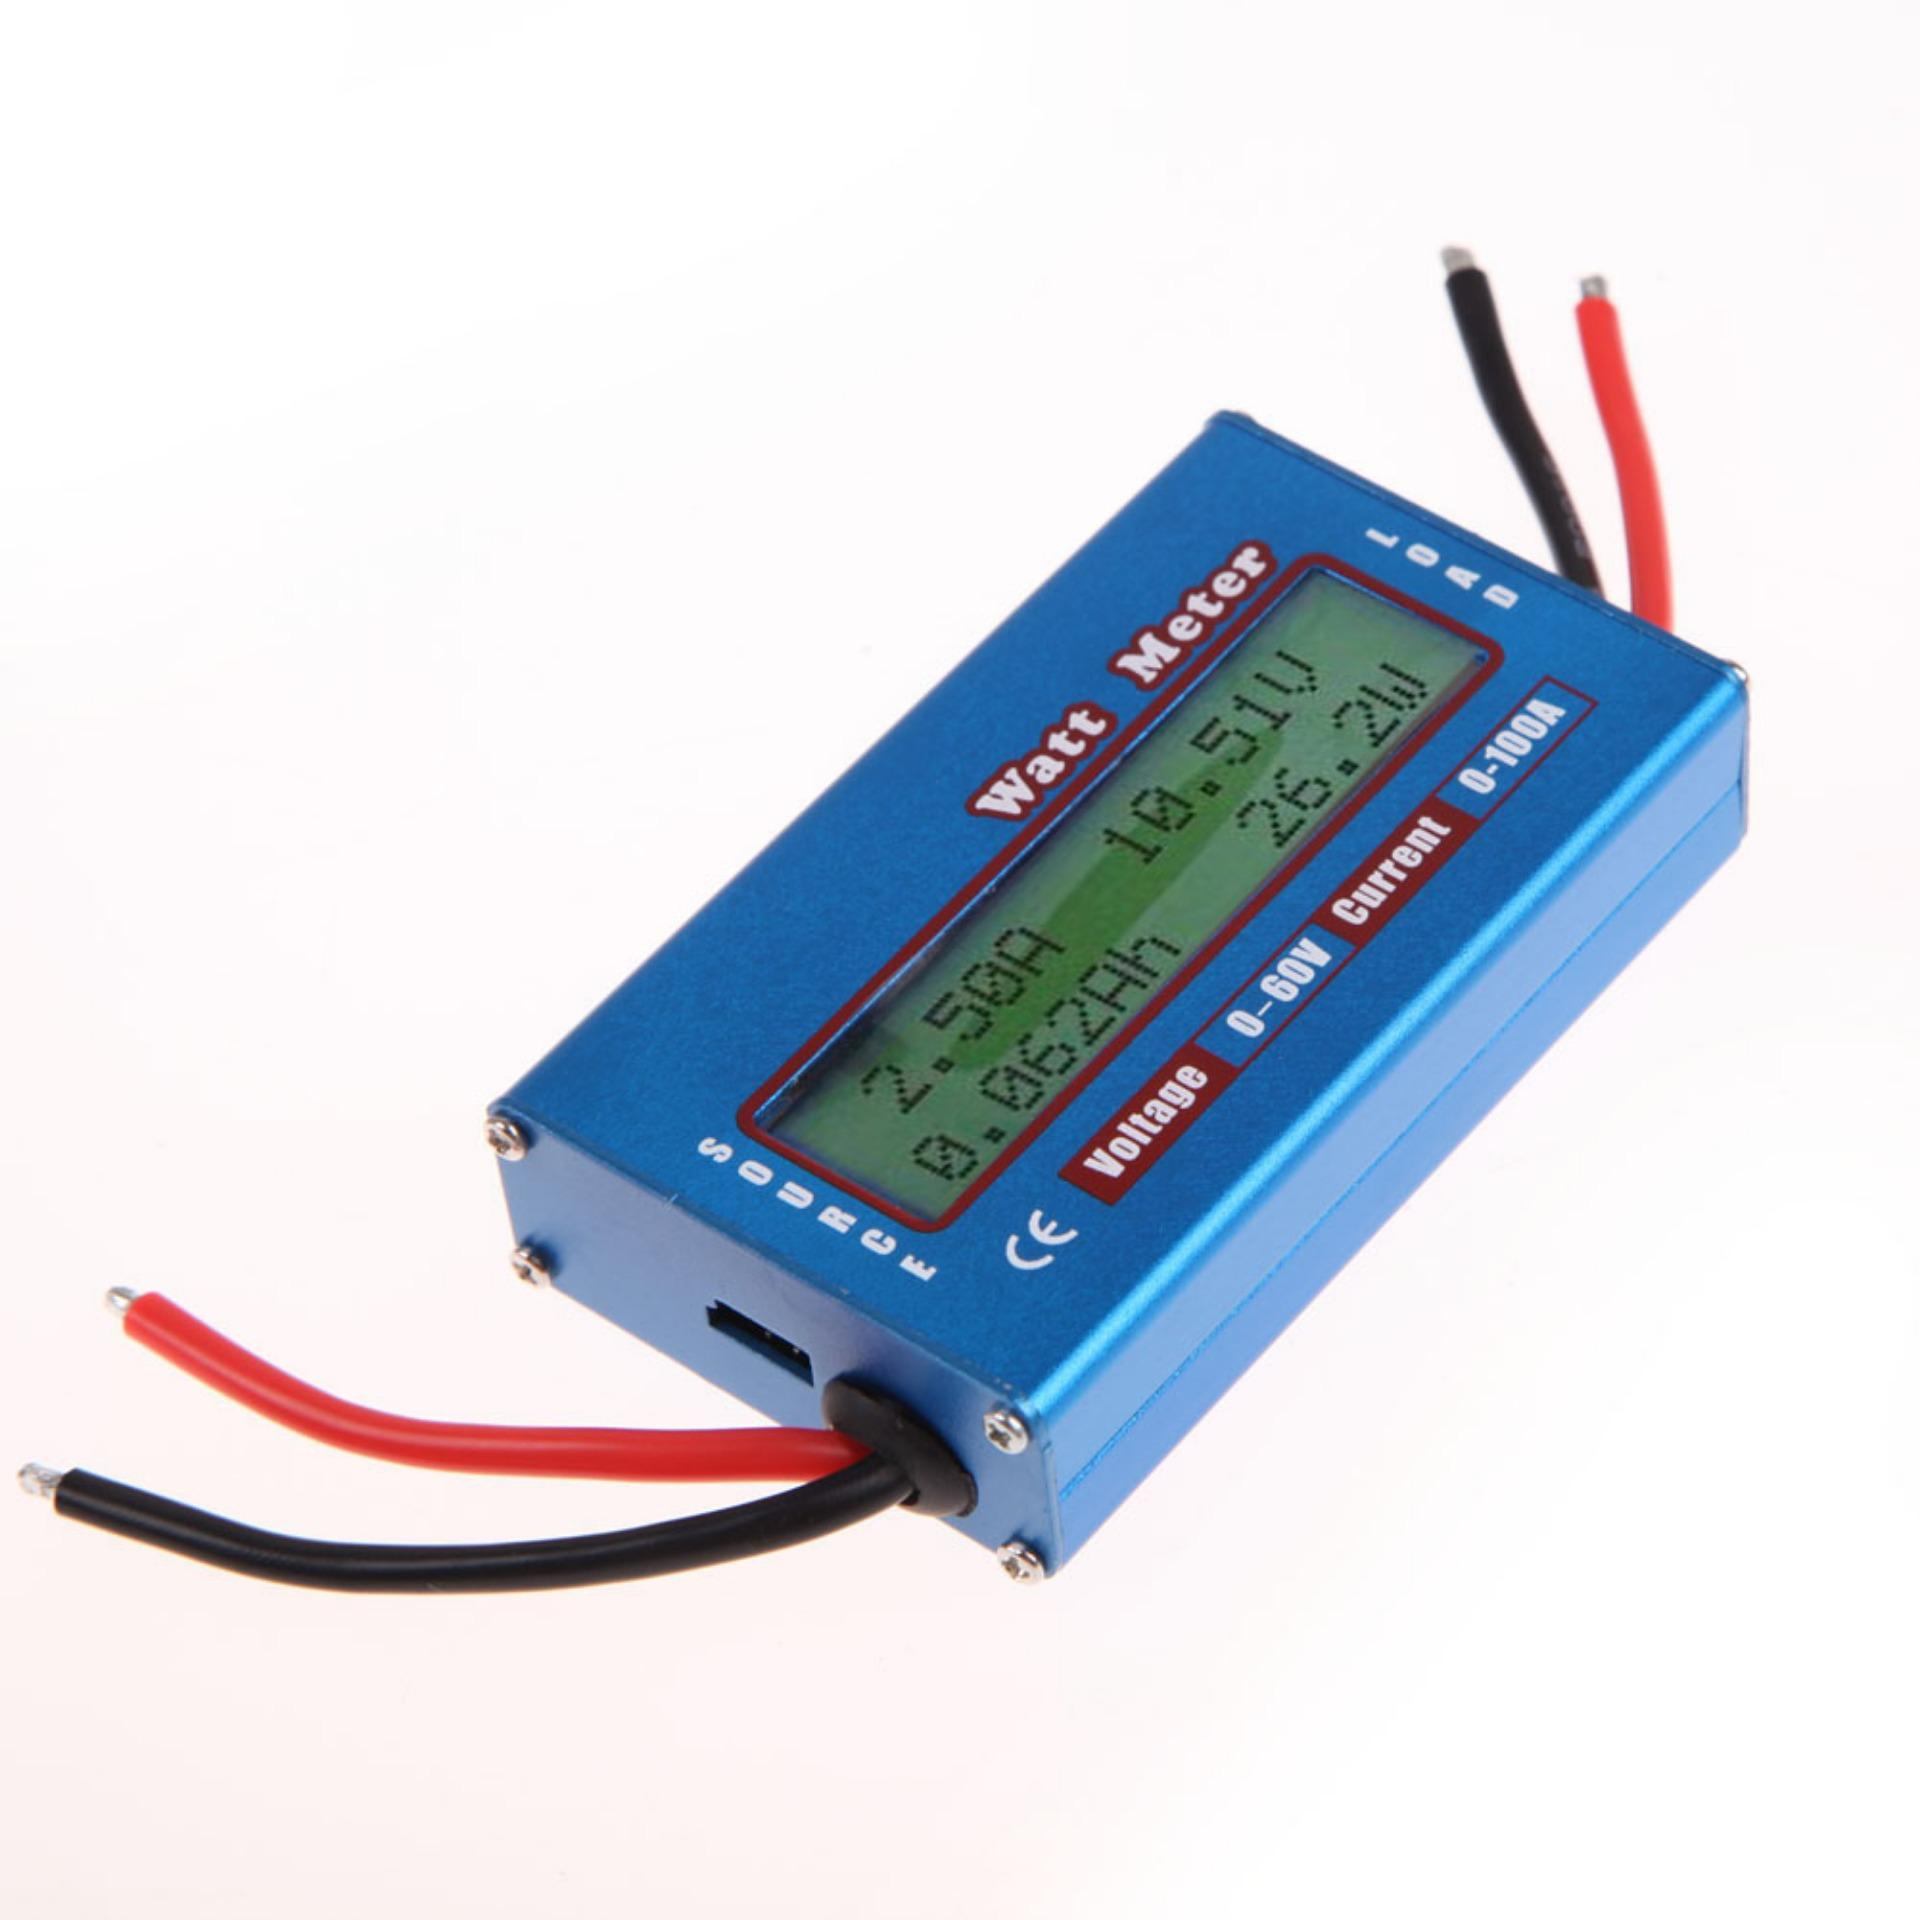 Beli Sederhana Dc Power Analyzer Watt Volt Amp Meter 12 V 24 V Solar Wind Analyzer Intl Intl Lengkap